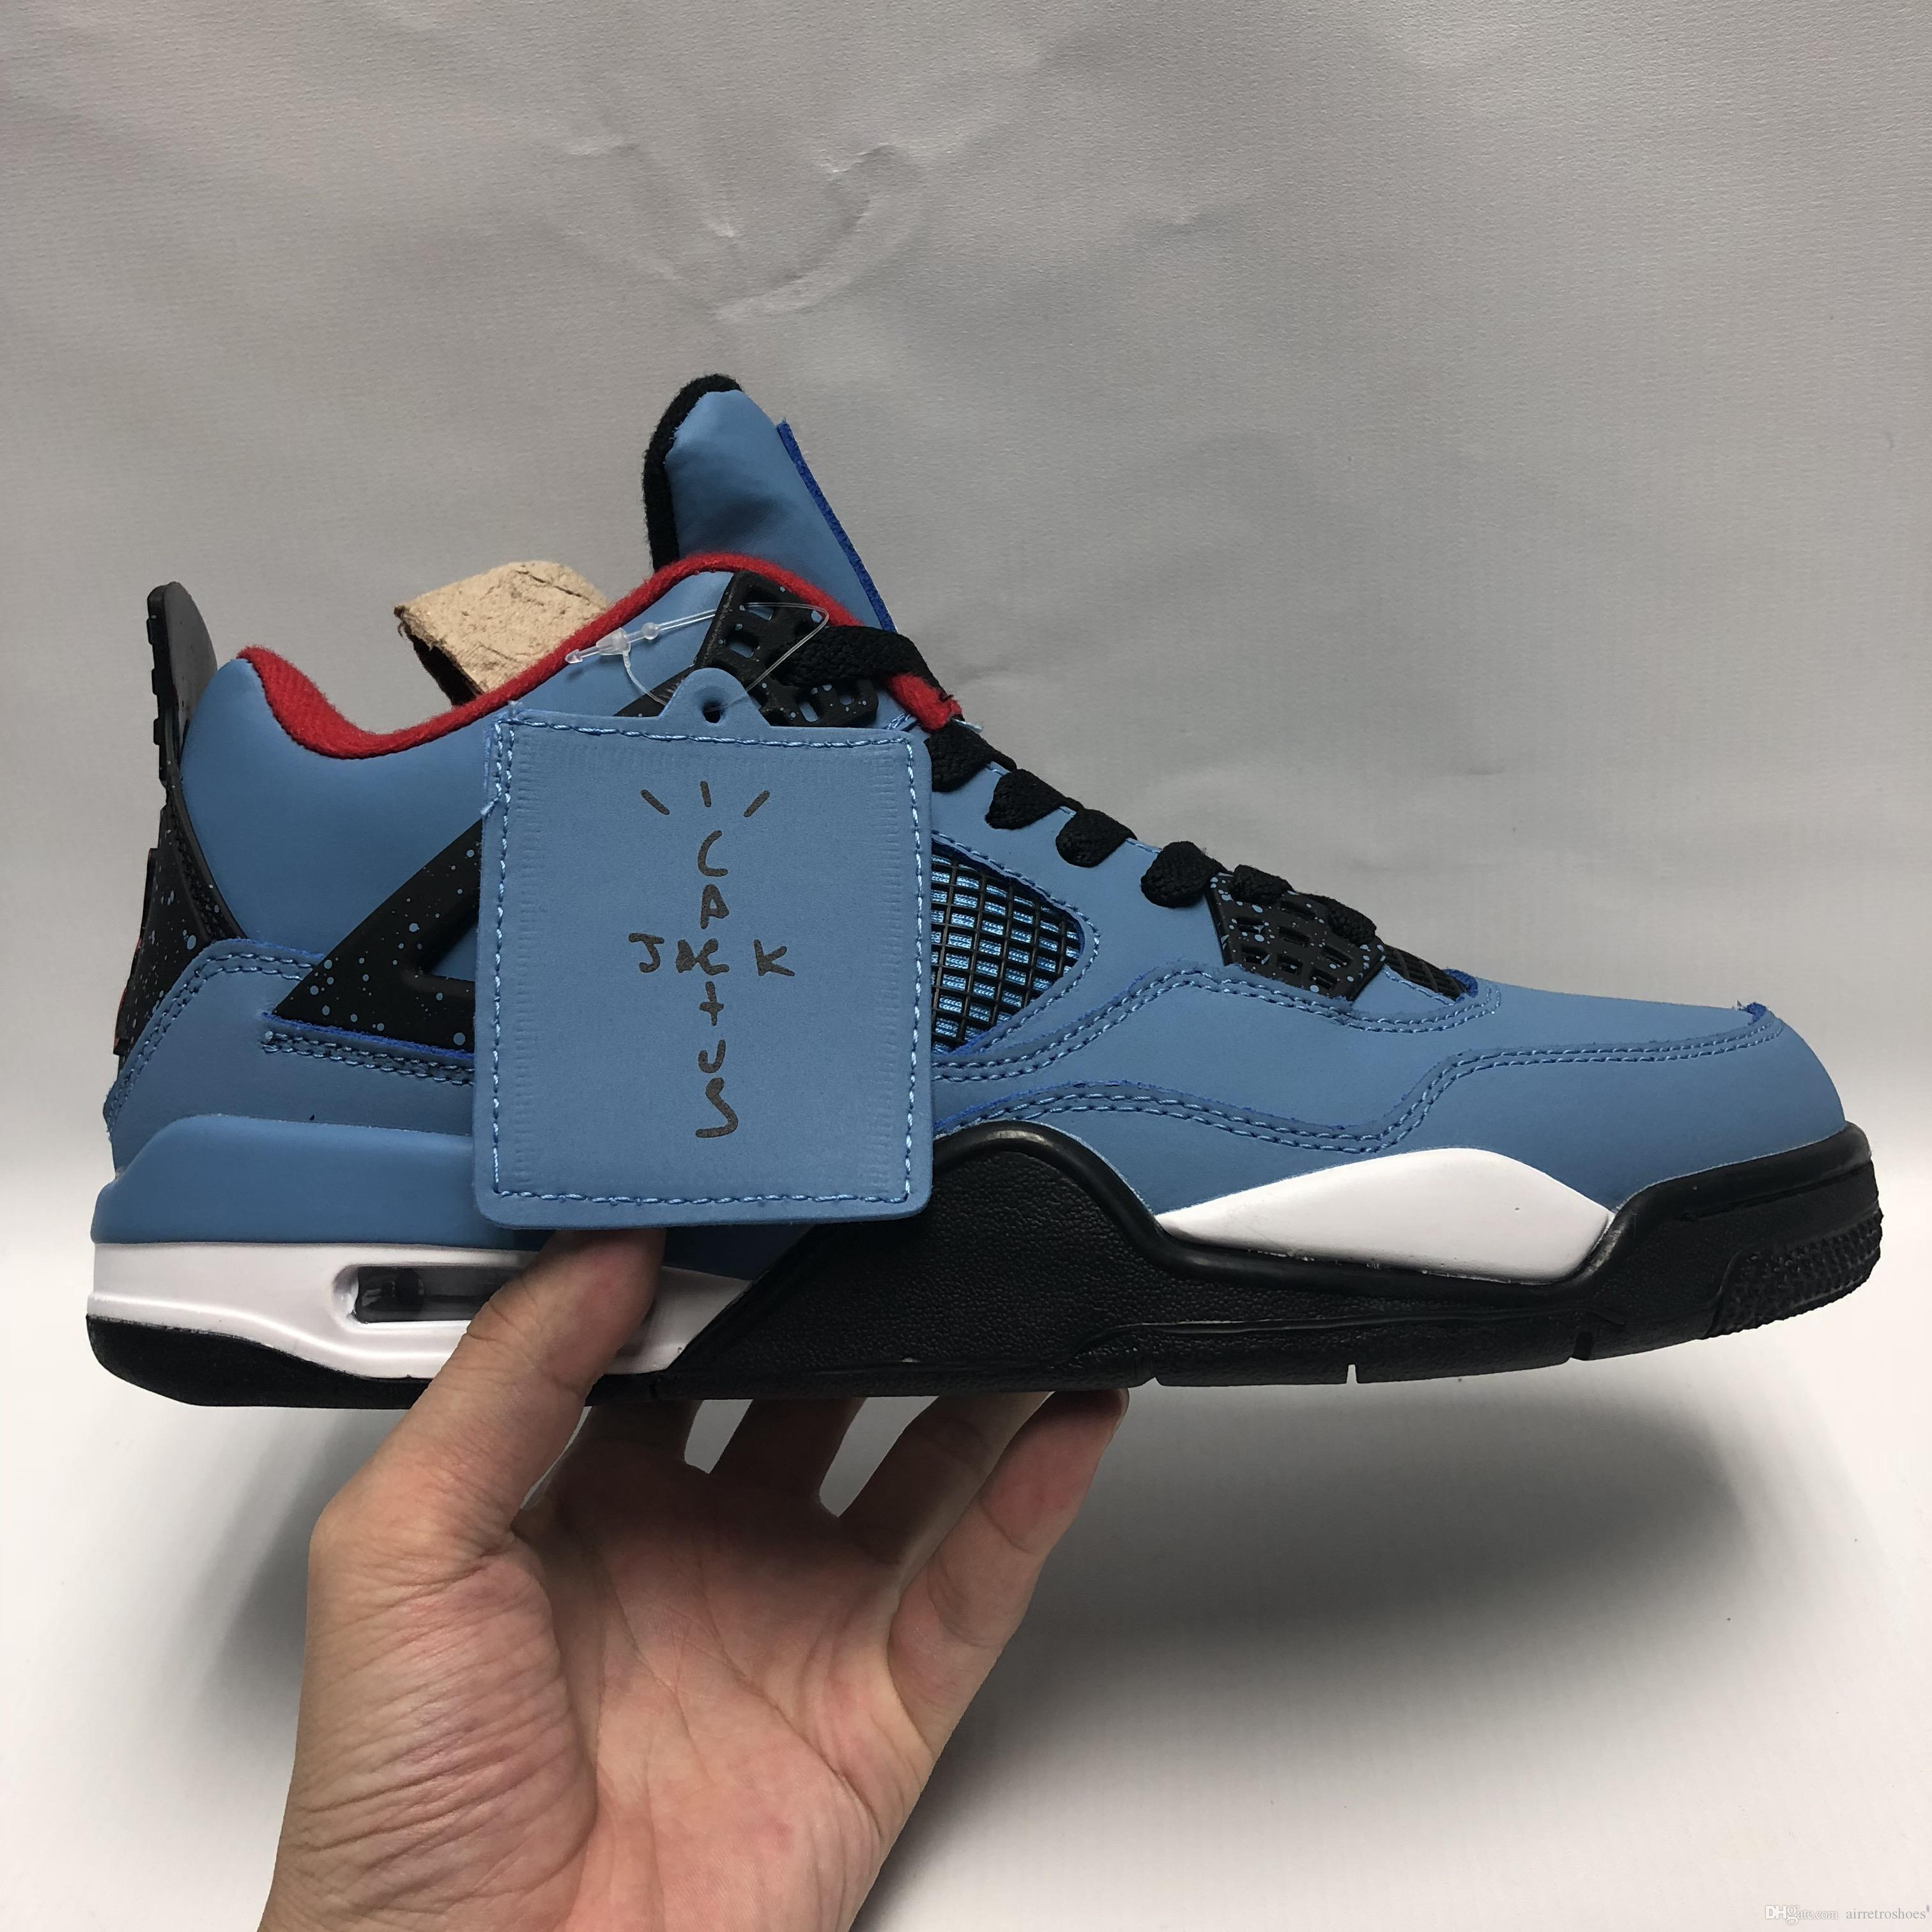 New Travis X 4 4s IV Mens Basketball Shoes Hot Houston University ... 20bf03509